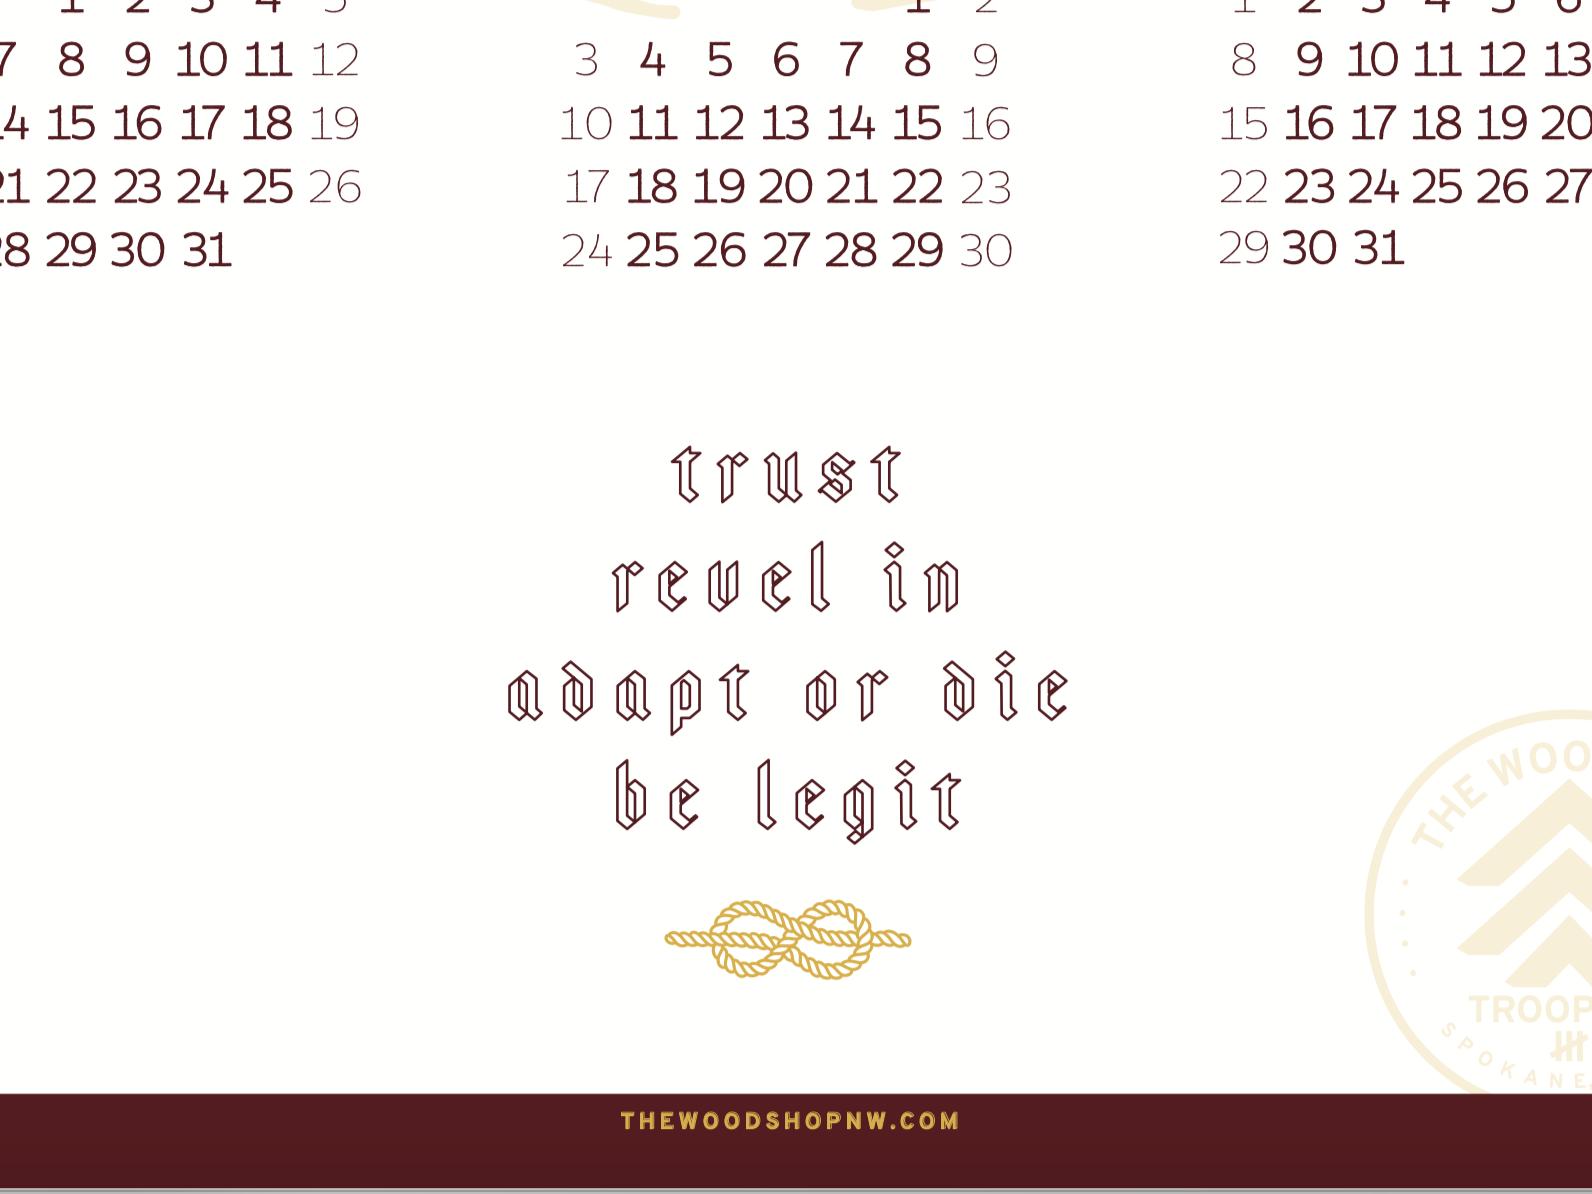 2019 Calendar - TWS Troop #924 rope knot blackletter 2019 christmas scouts typography spokane the woodshop calendar